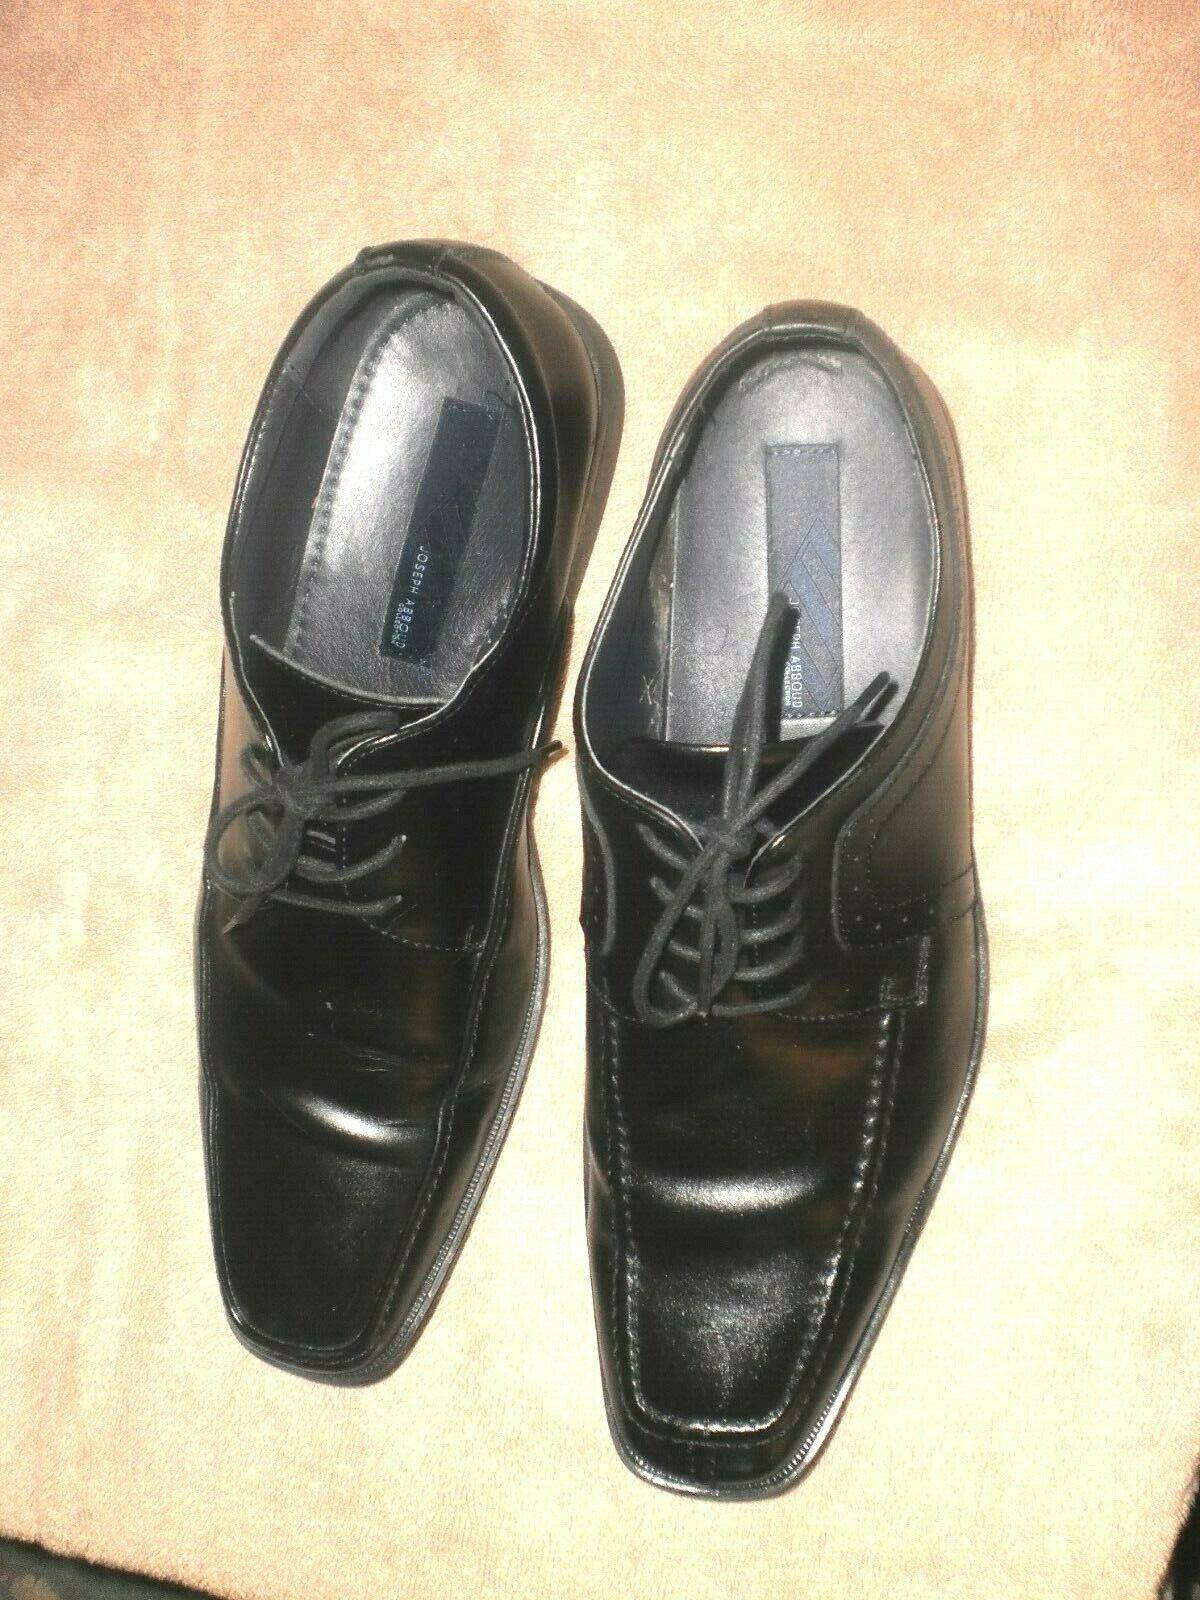 Mens/teen Joseph Abboud Black Dress Shoes Sz 12 M Leather Upper sole lining